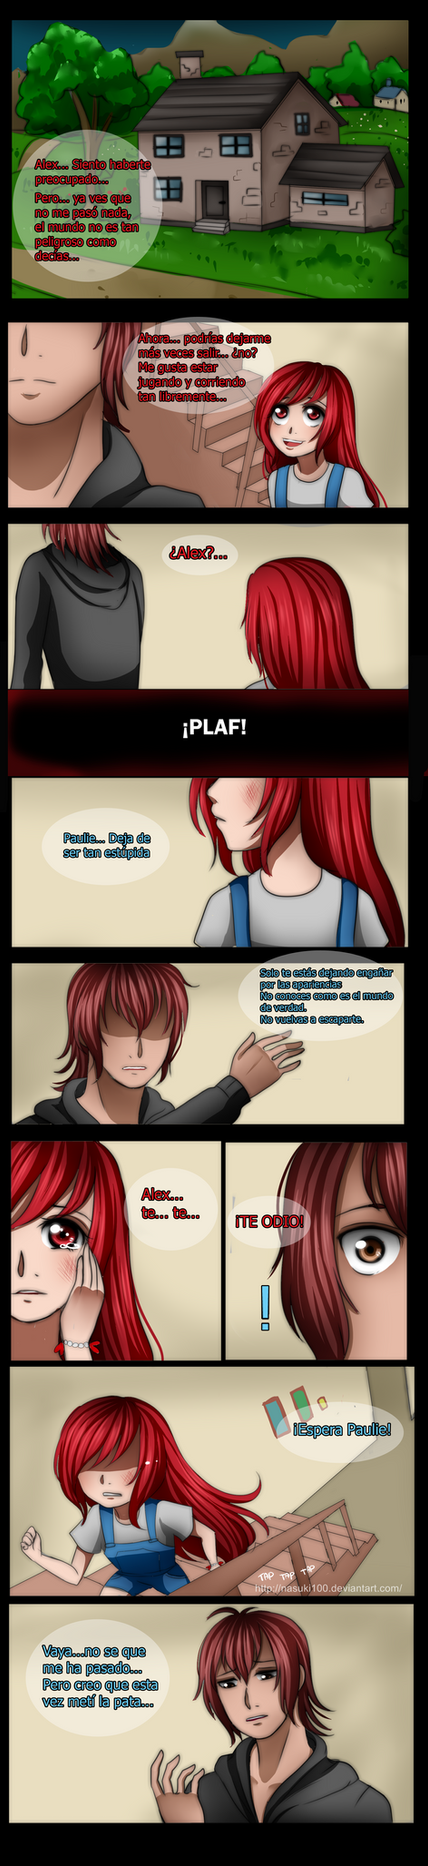 Cherry Pau - pag 18 [translation in description] by Nasuki100